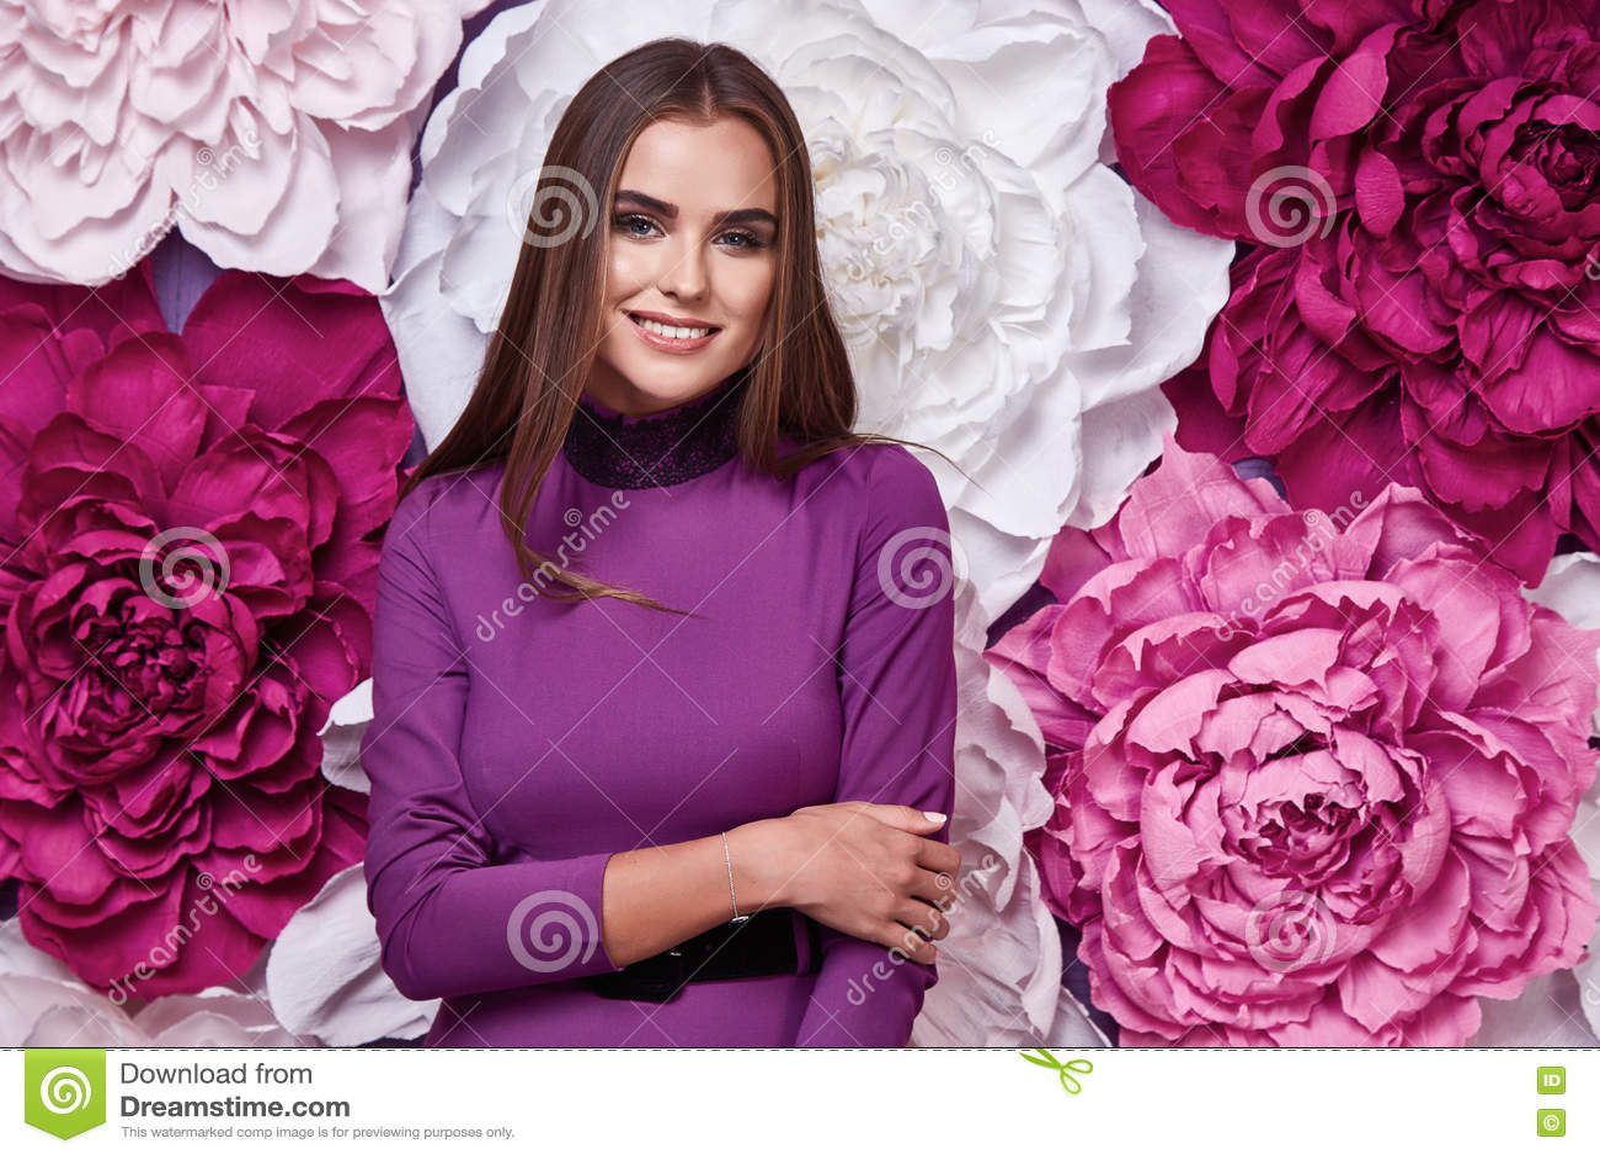 Retrato del maquillaje natural brillante de la mujer atractiva hermosa joven